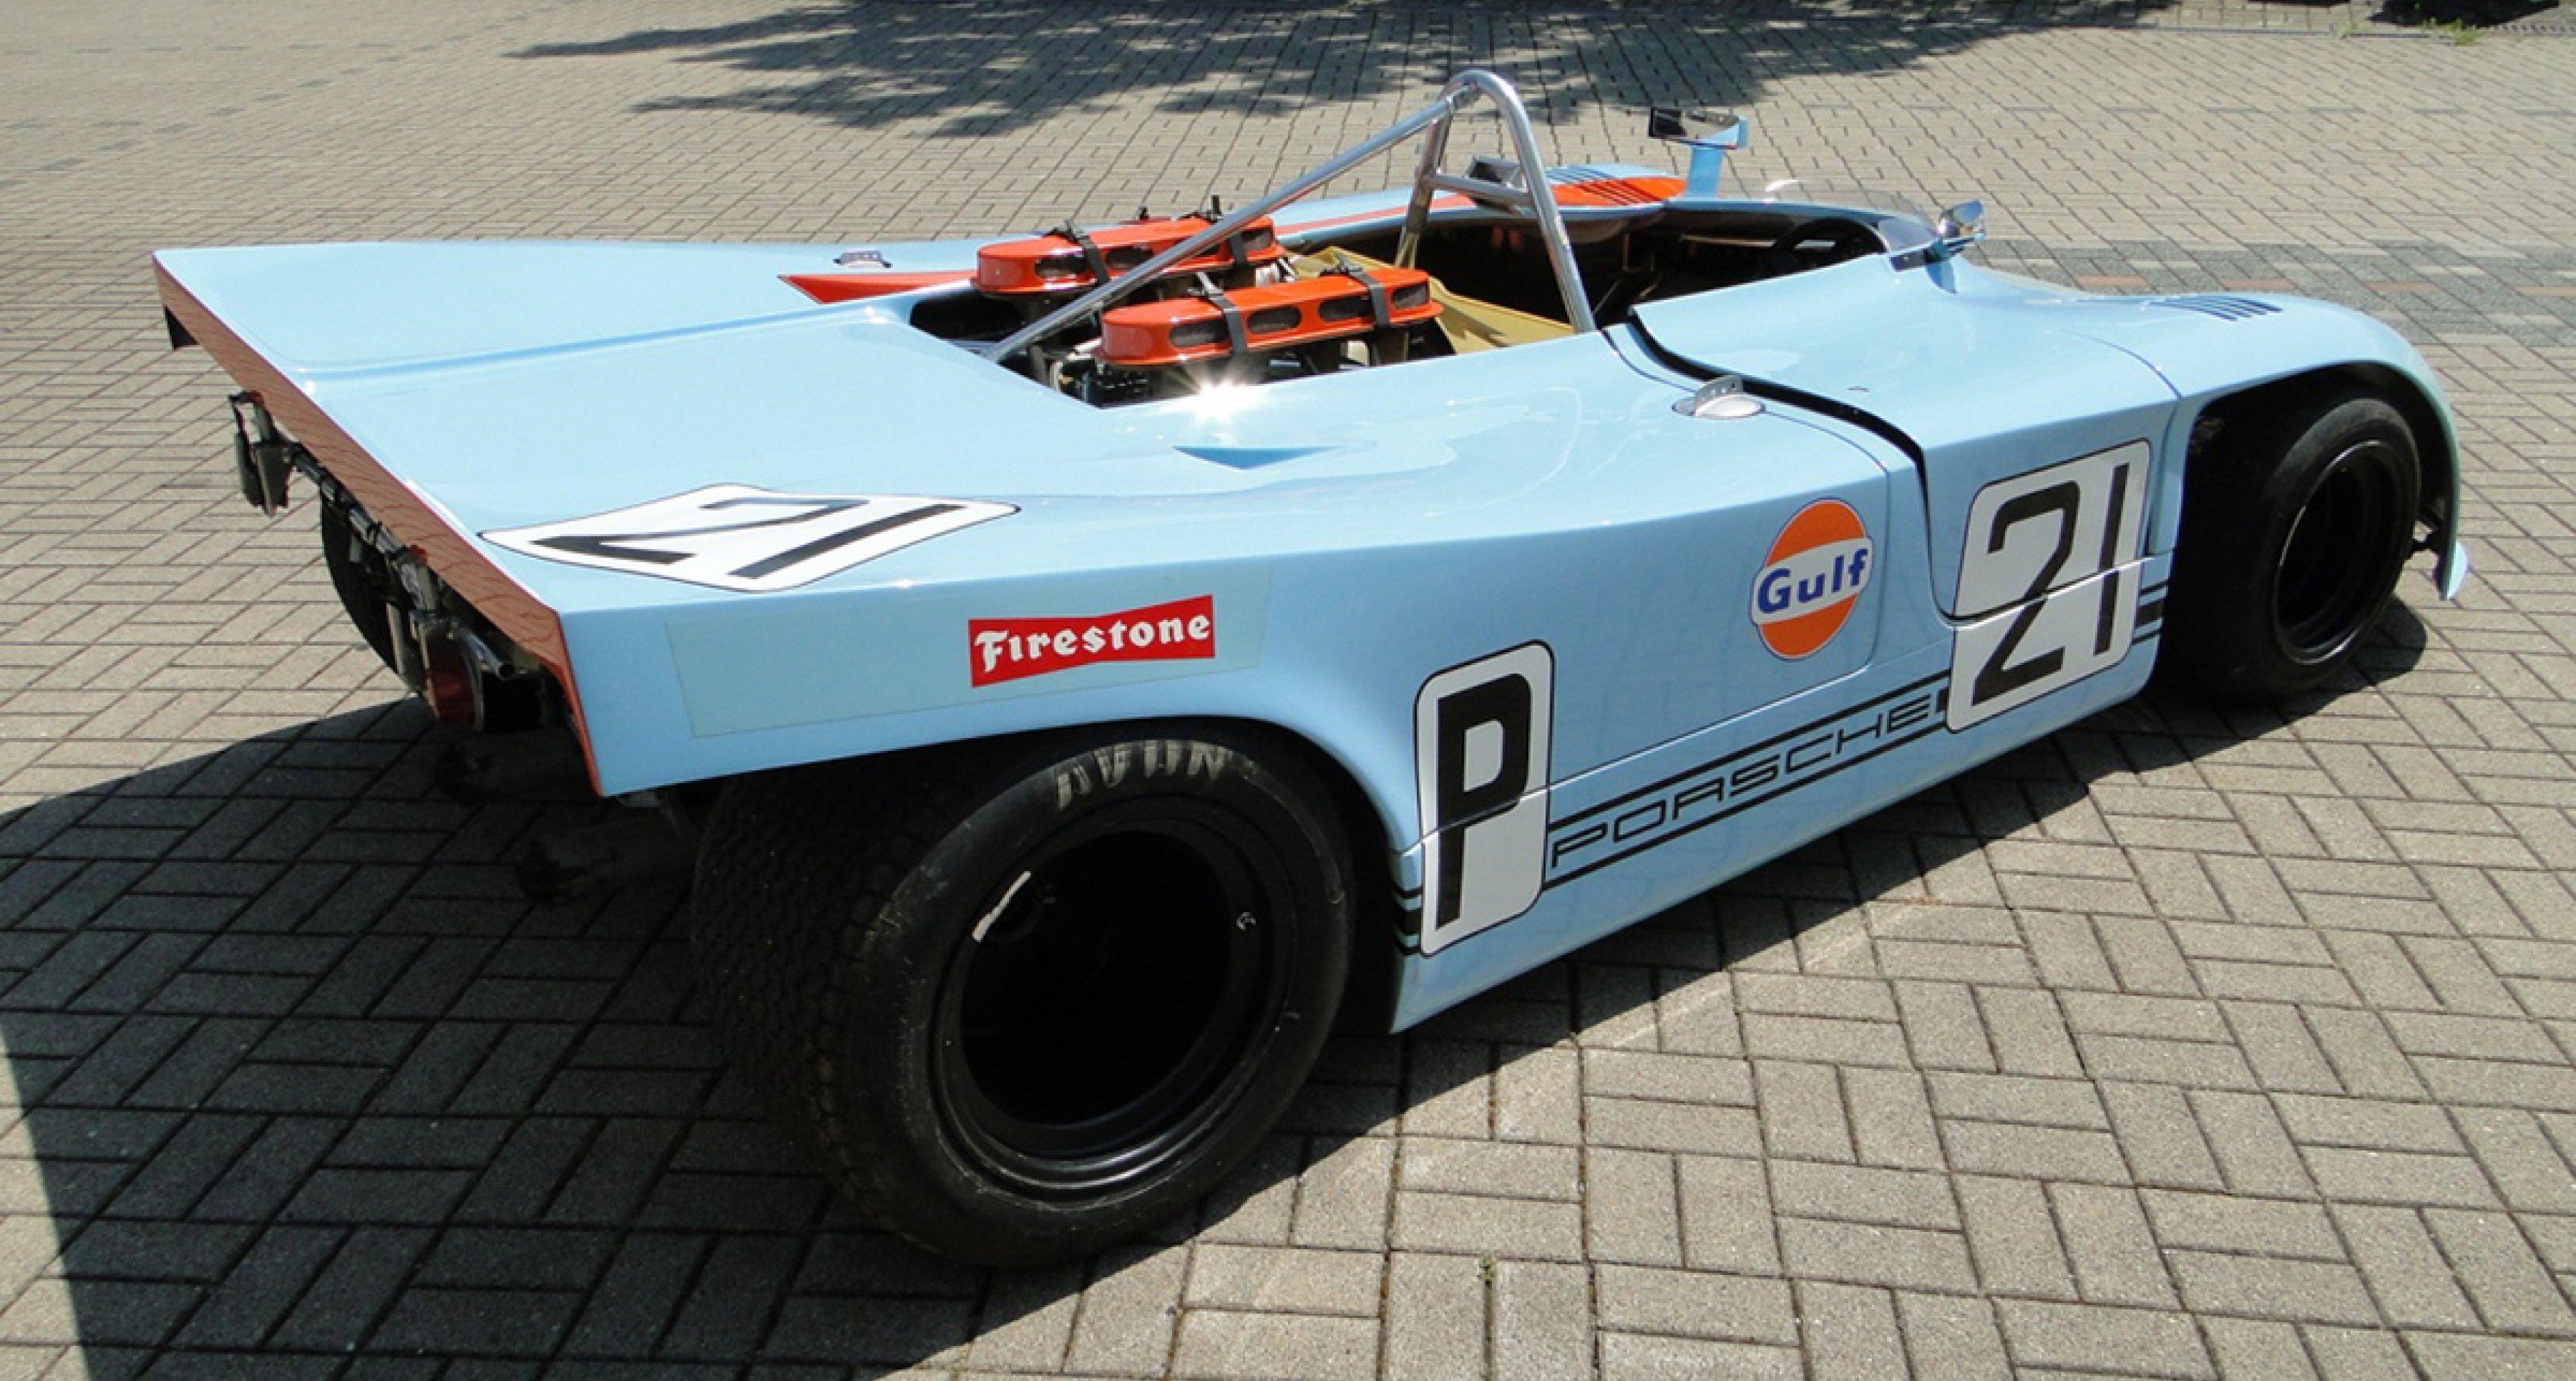 1970 Porsche 908/3 004 Spyder